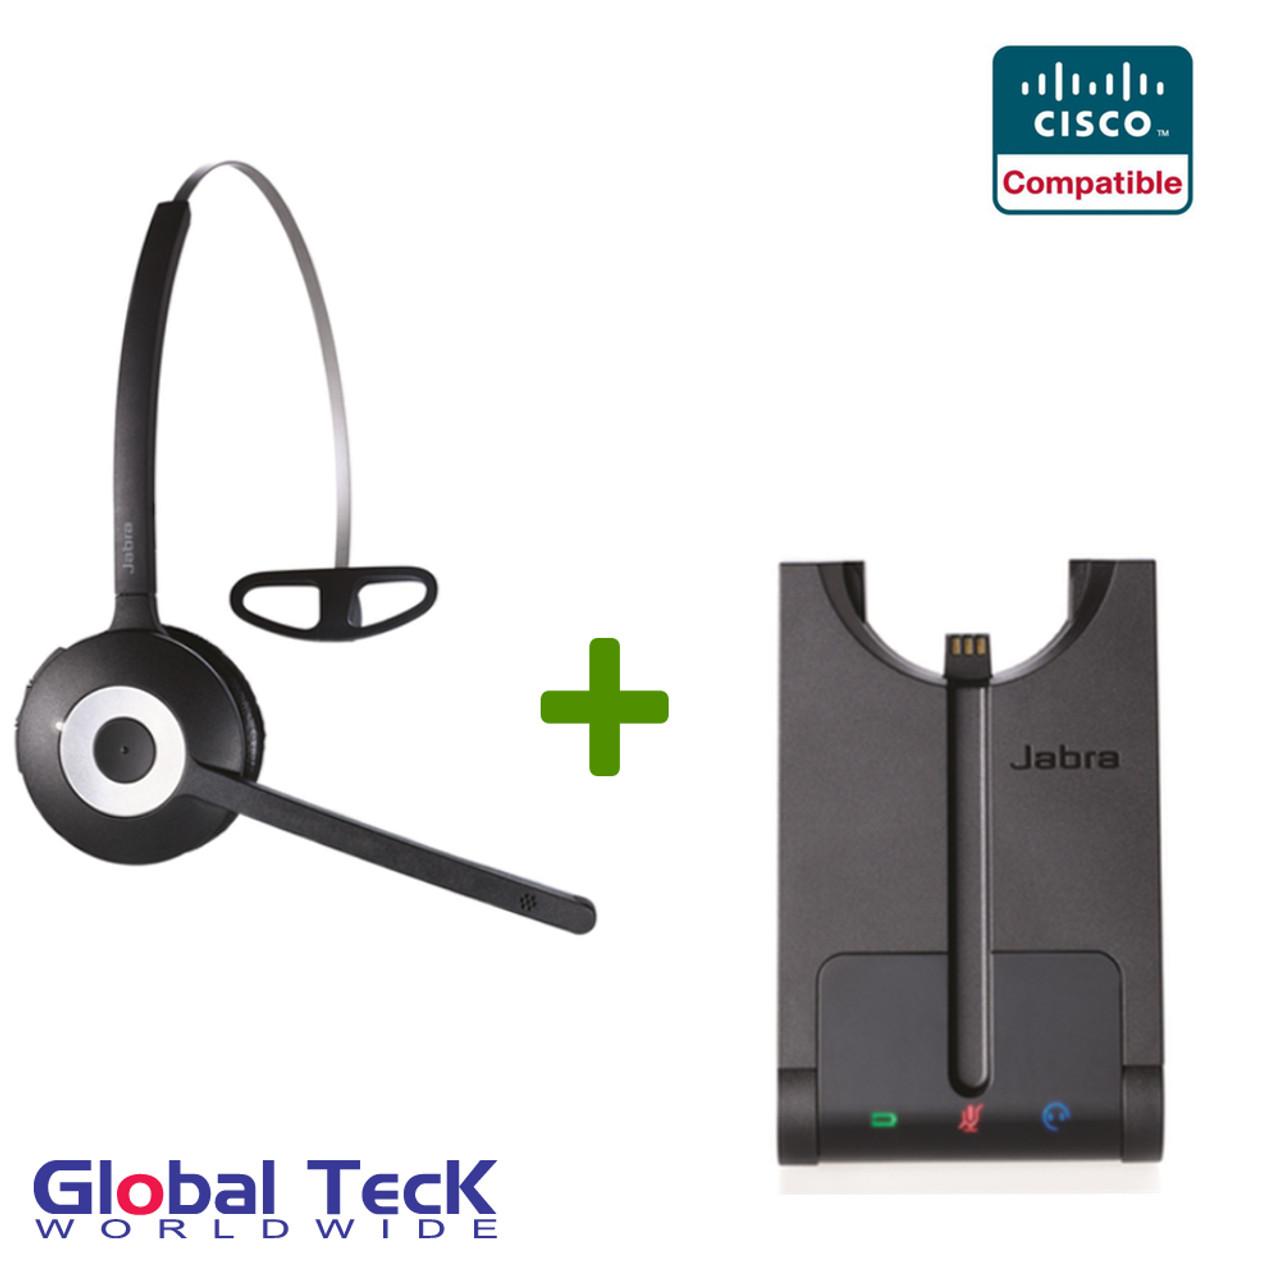 Cisco Compatible Jabra Pro 920 Wireless Headset System Cisco Compatible Linksys Spa Series 501g 502g 504g 508g 509g 525g 3900 7900 Series 3910 3911 3915 7902 7905 7910 7910 Sw 7912 7931 7937 7940 7941 7942 7945 7960 7961